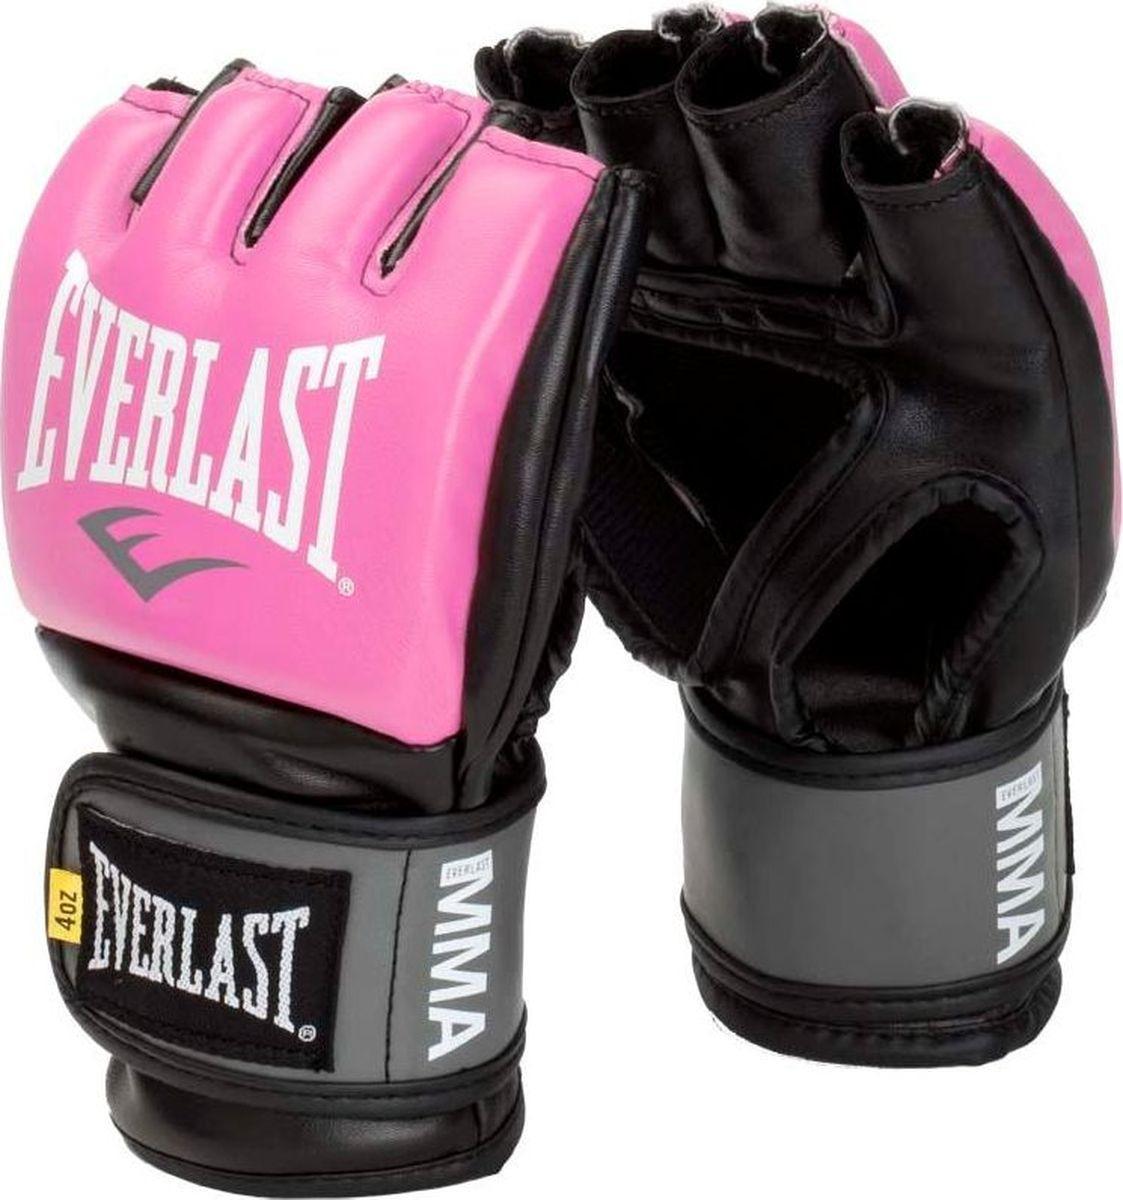 Перчатки для единоборств Everlast Pro Style Grappling, тренировочные, 7778PLXLU, розовый, размер L/XL цена